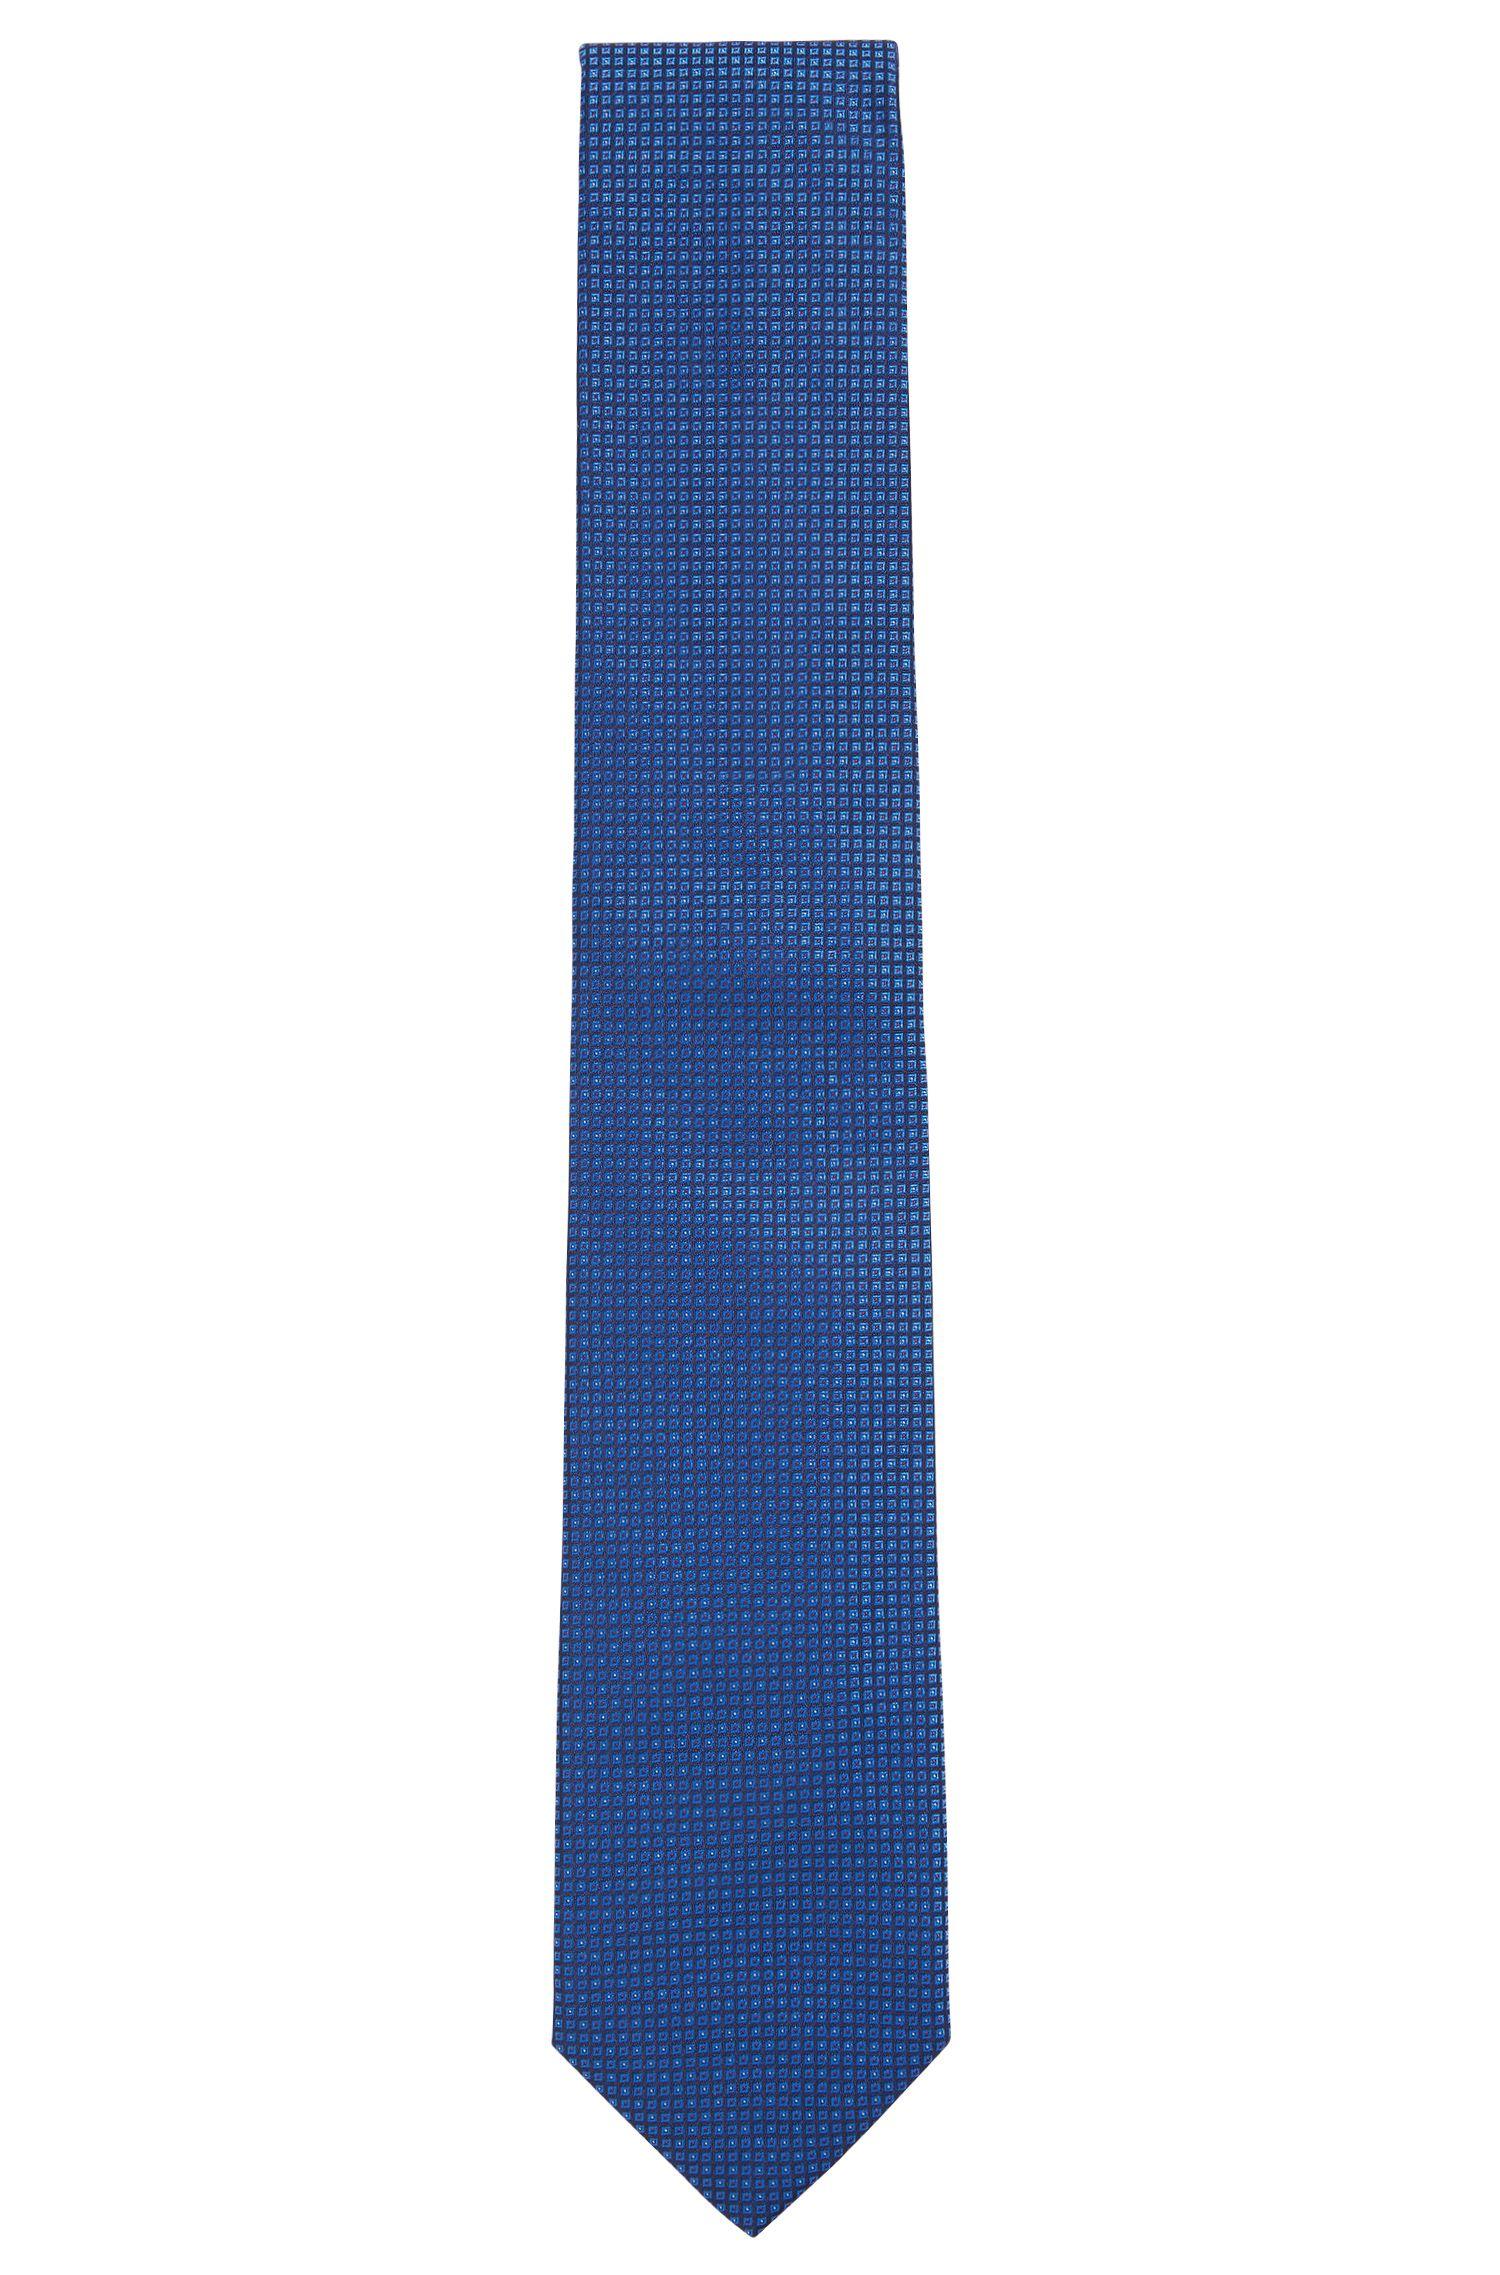 Nailhead Italian Silk Tie, Blue